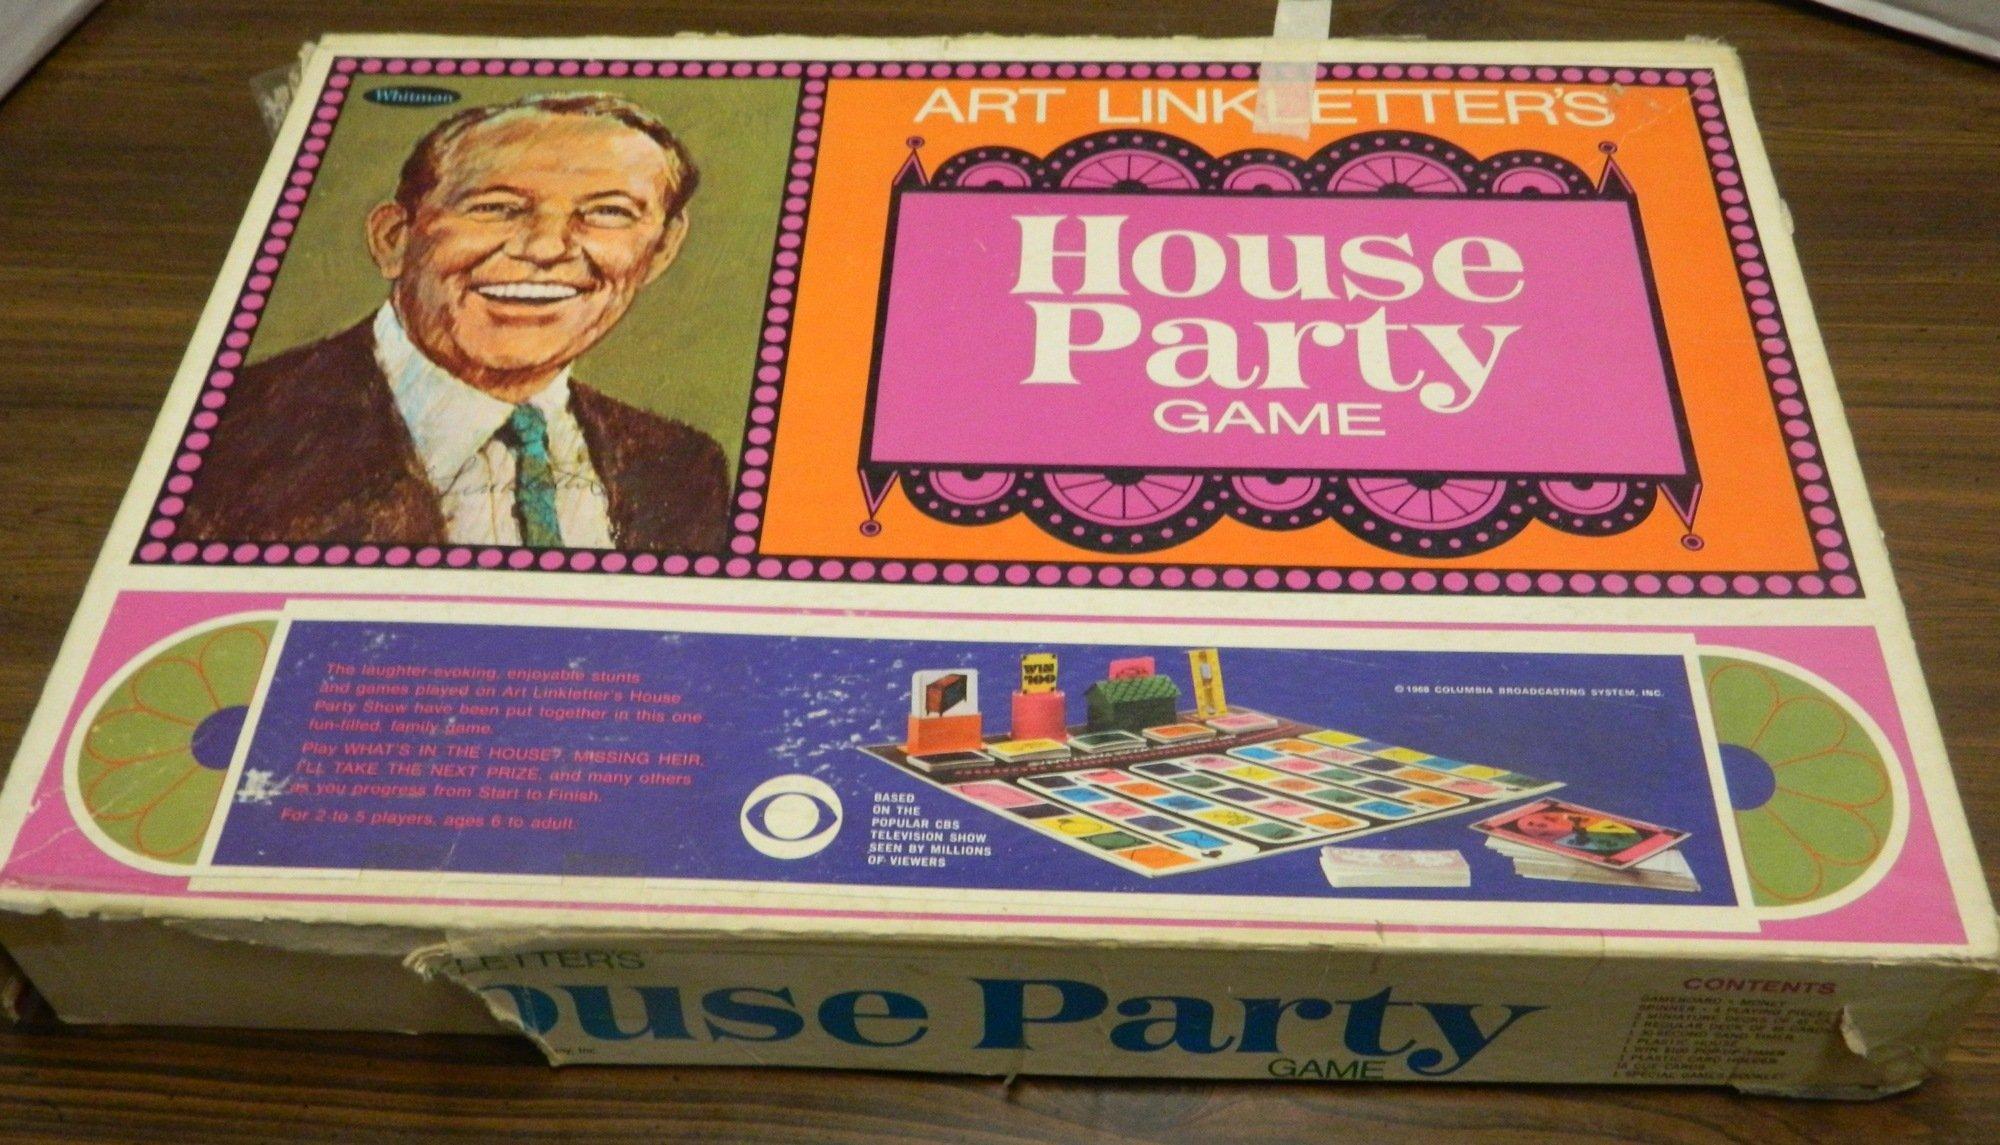 Box for Art Linkletter's House Party